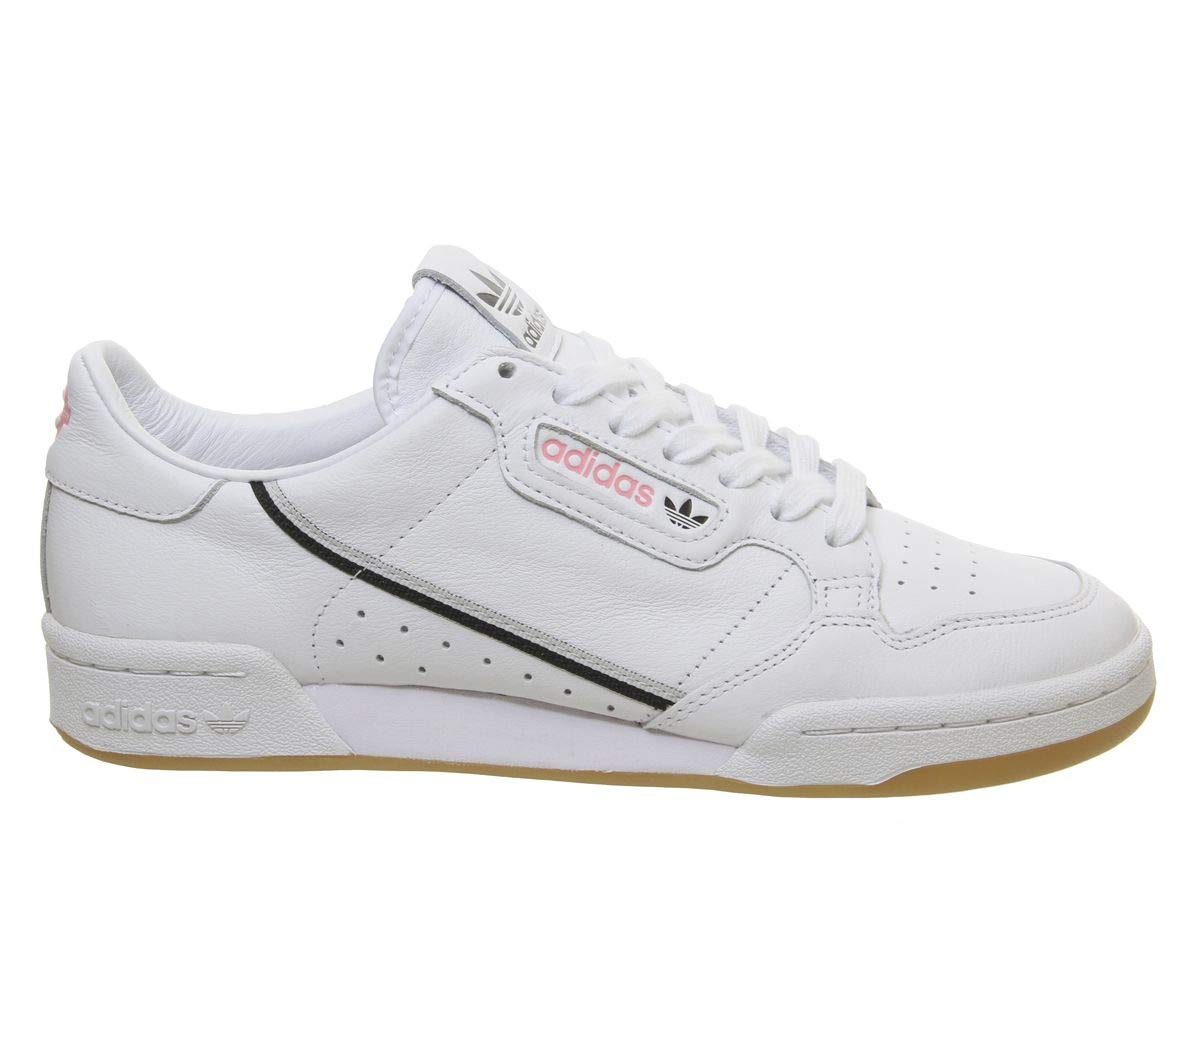 Adidas Continental Ginnastica Tfl Uomo Bianco A1ece8 Da ...